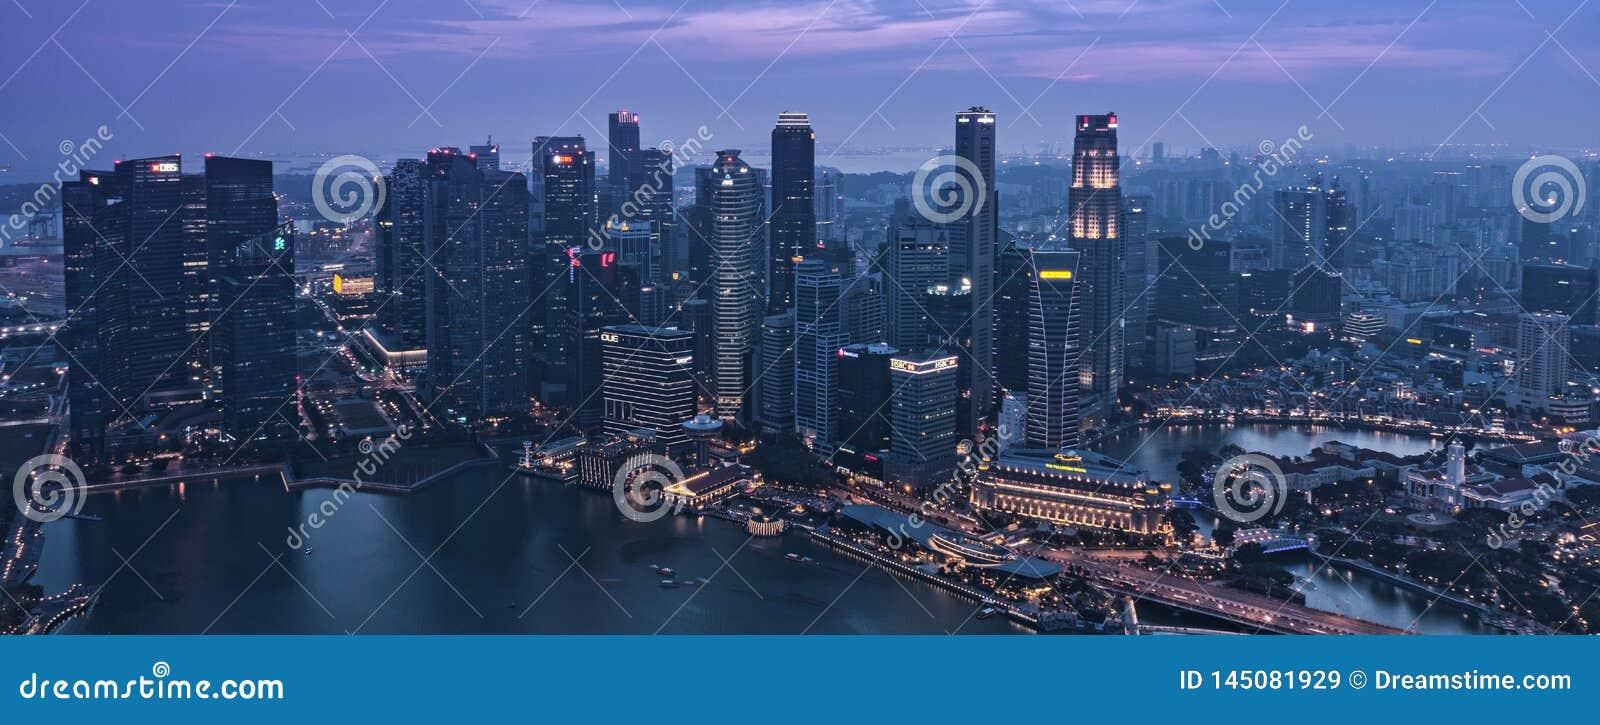 Twilight at Singapore Downtown CBD Marina Bay Skyscrapers - Awakening of Night